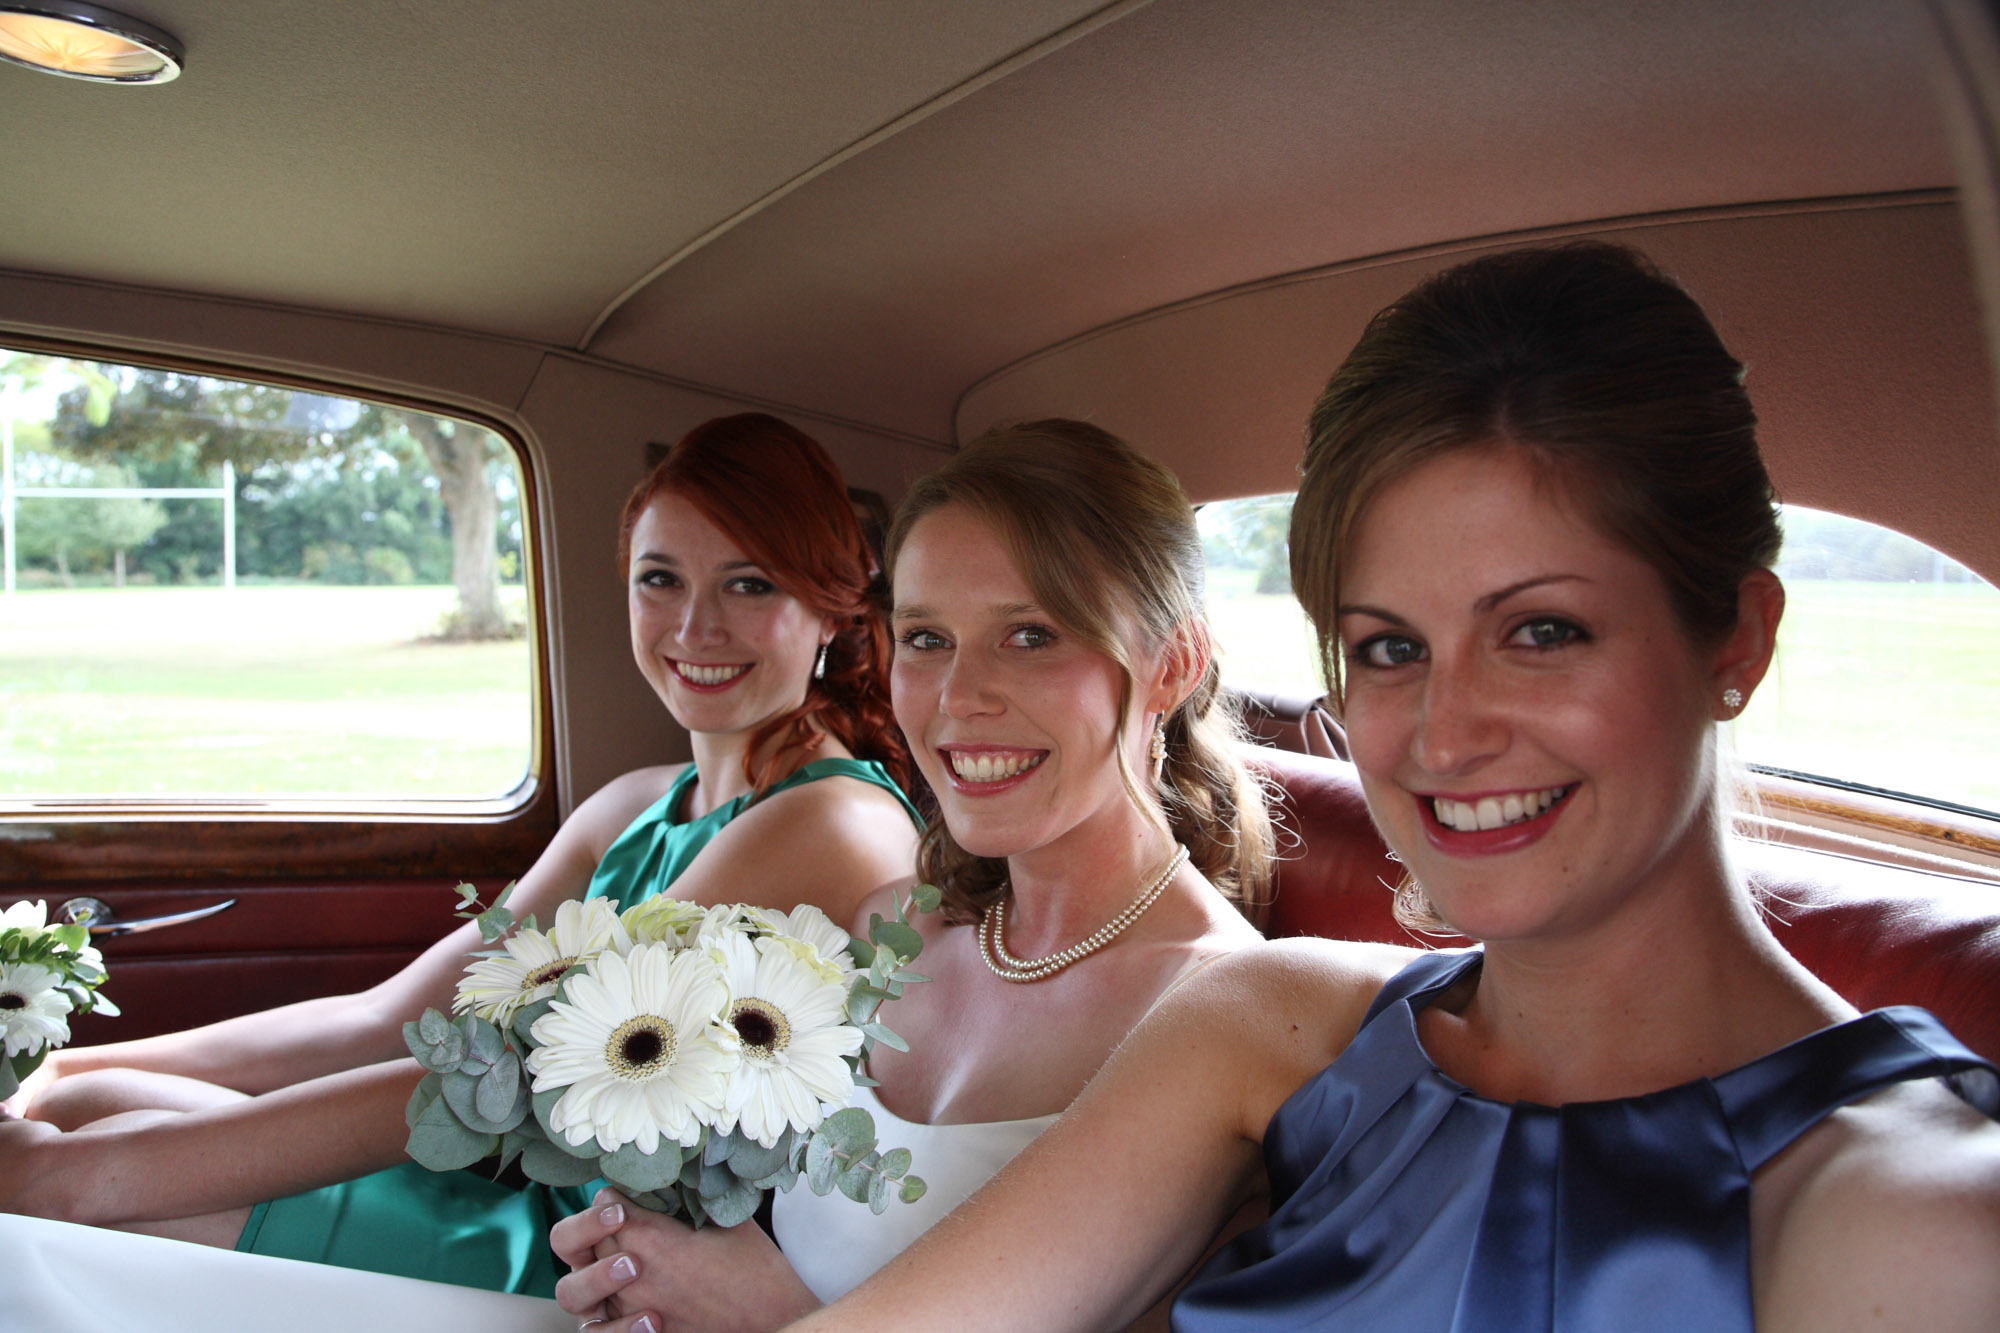 weddings-couples-love-photographer-oxford-london-jonathan-self-photography-14.jpg